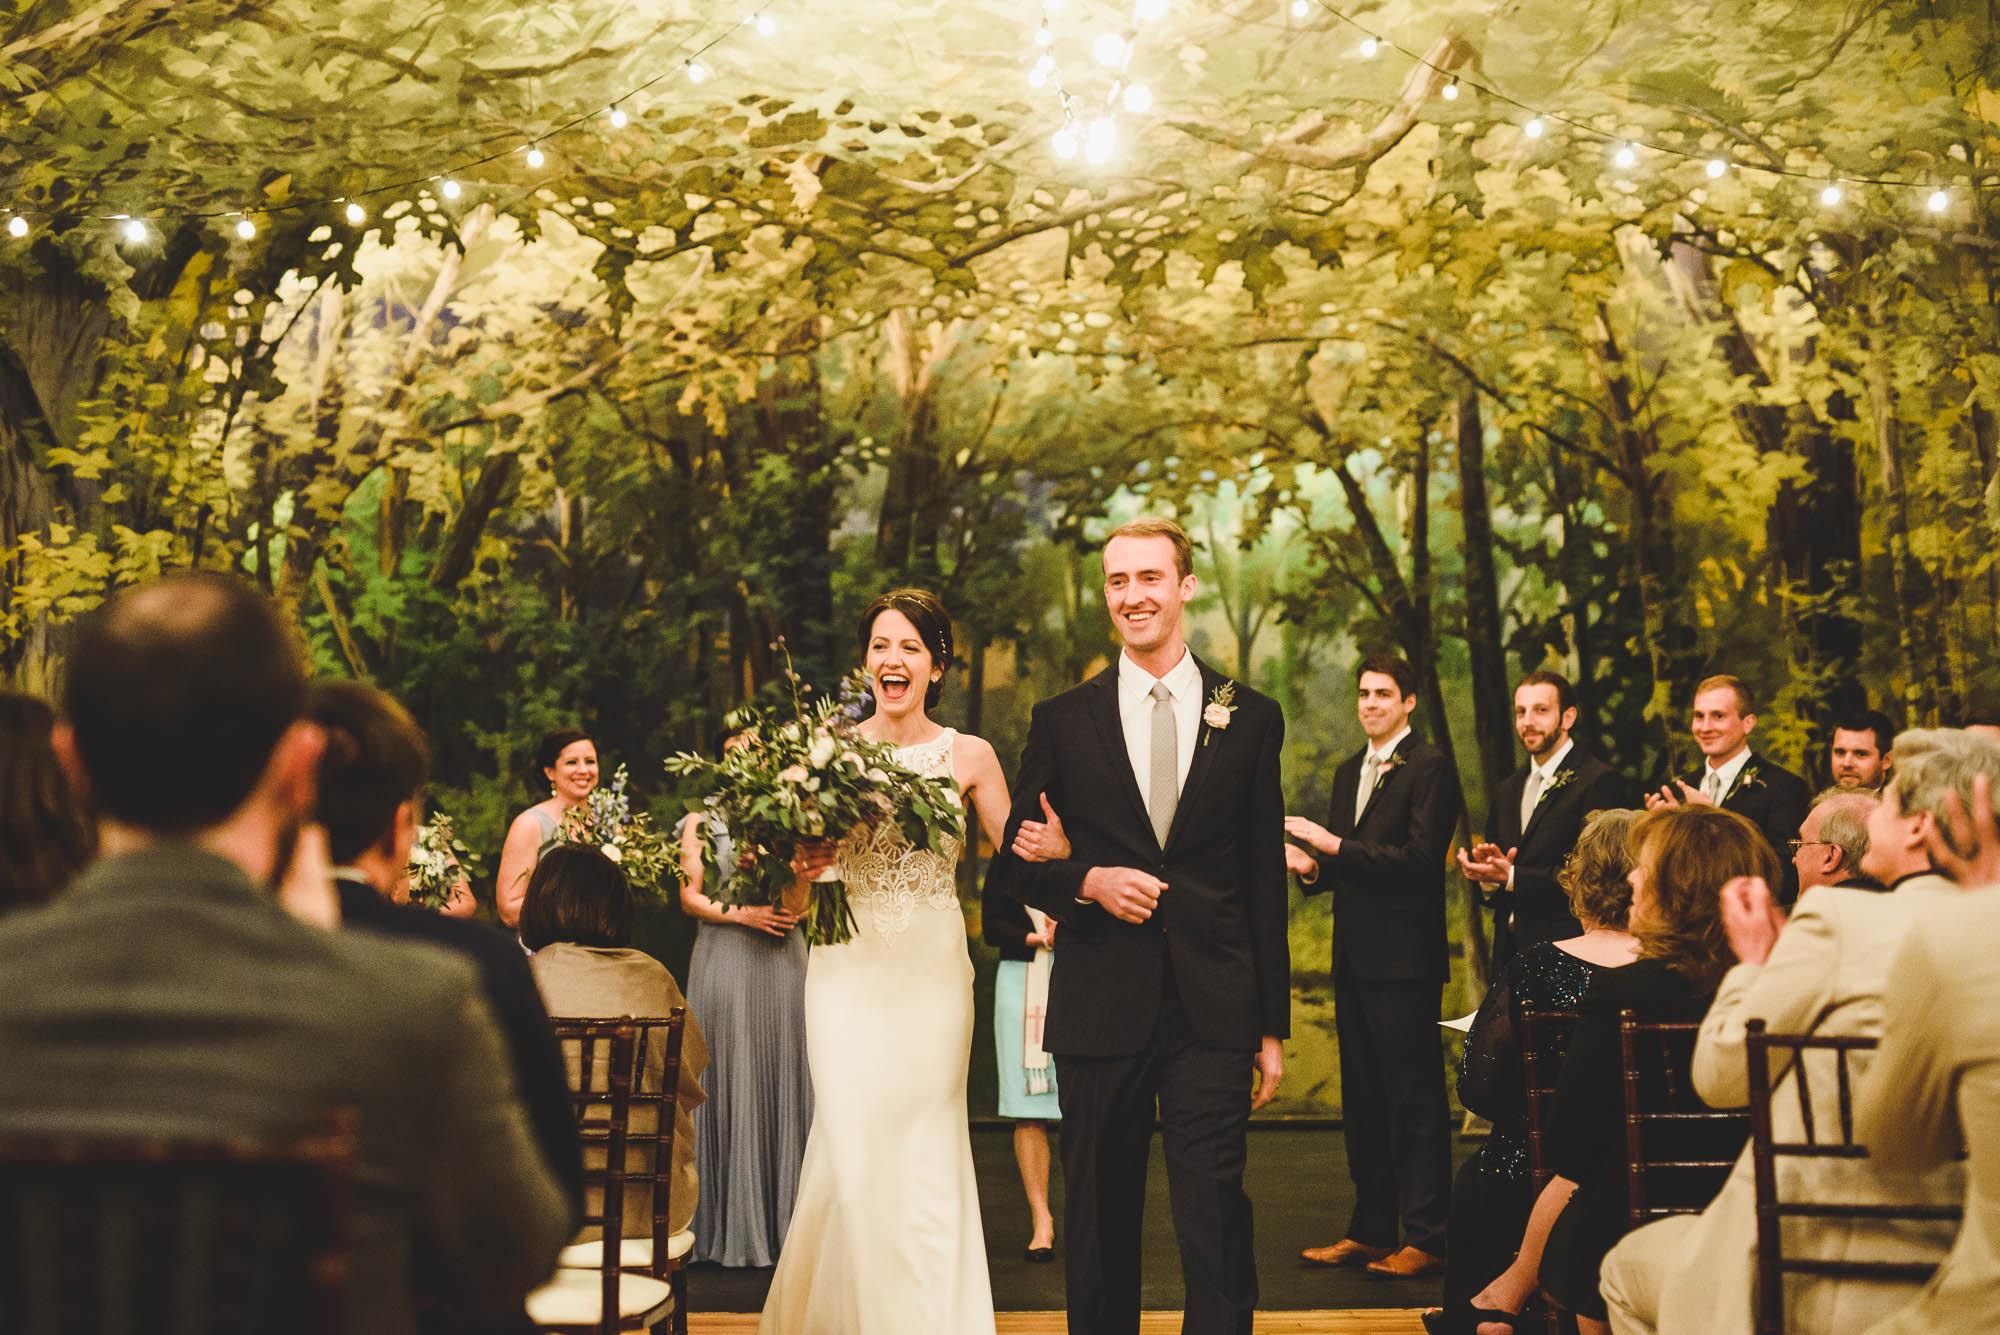 AVL weddings